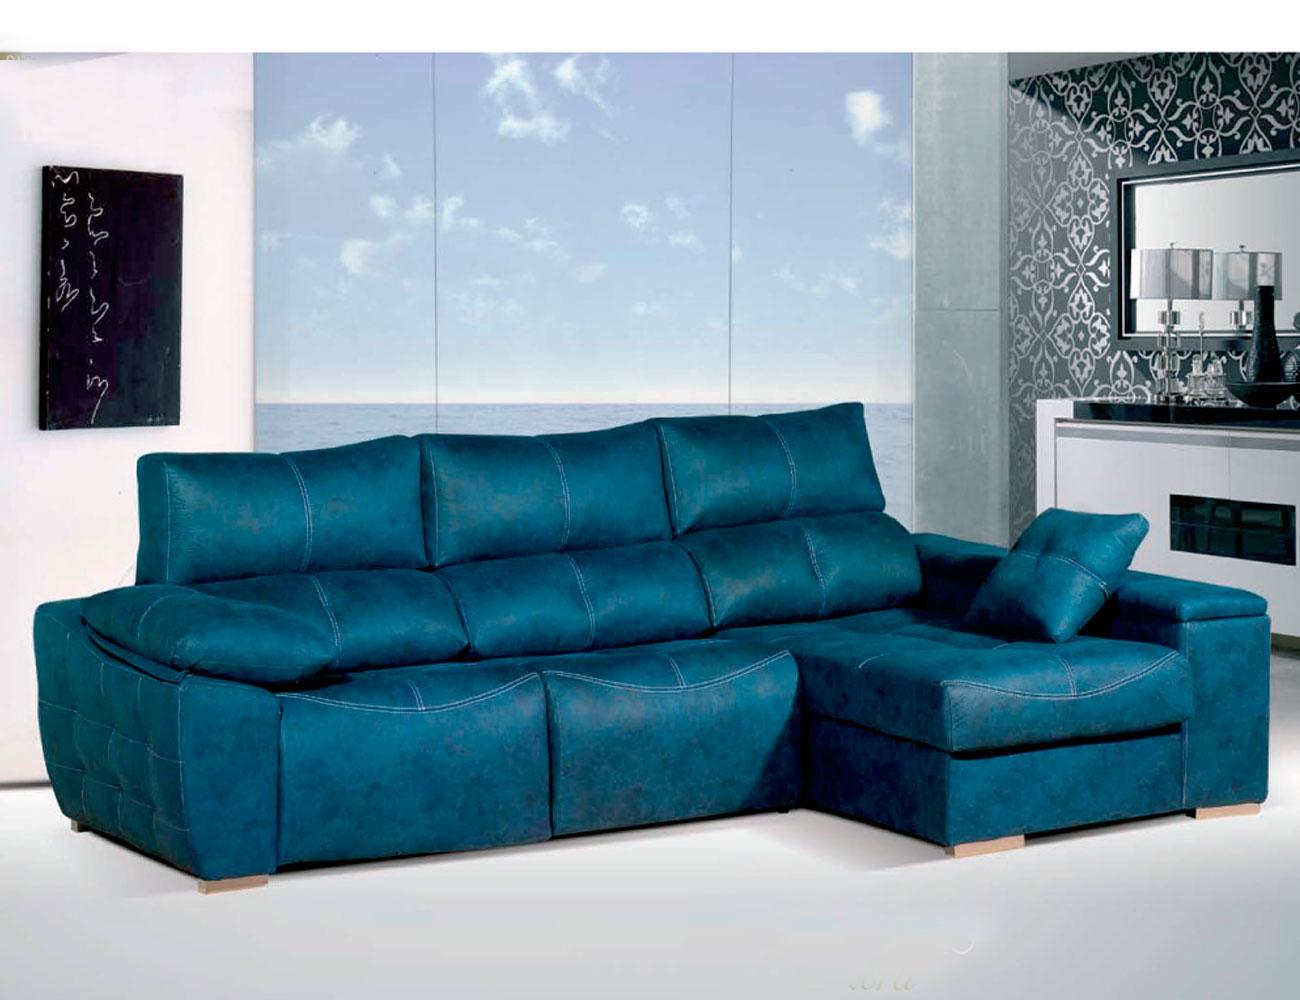 Sofa chaiselongue relax 2 motores anti manchas turquesa43